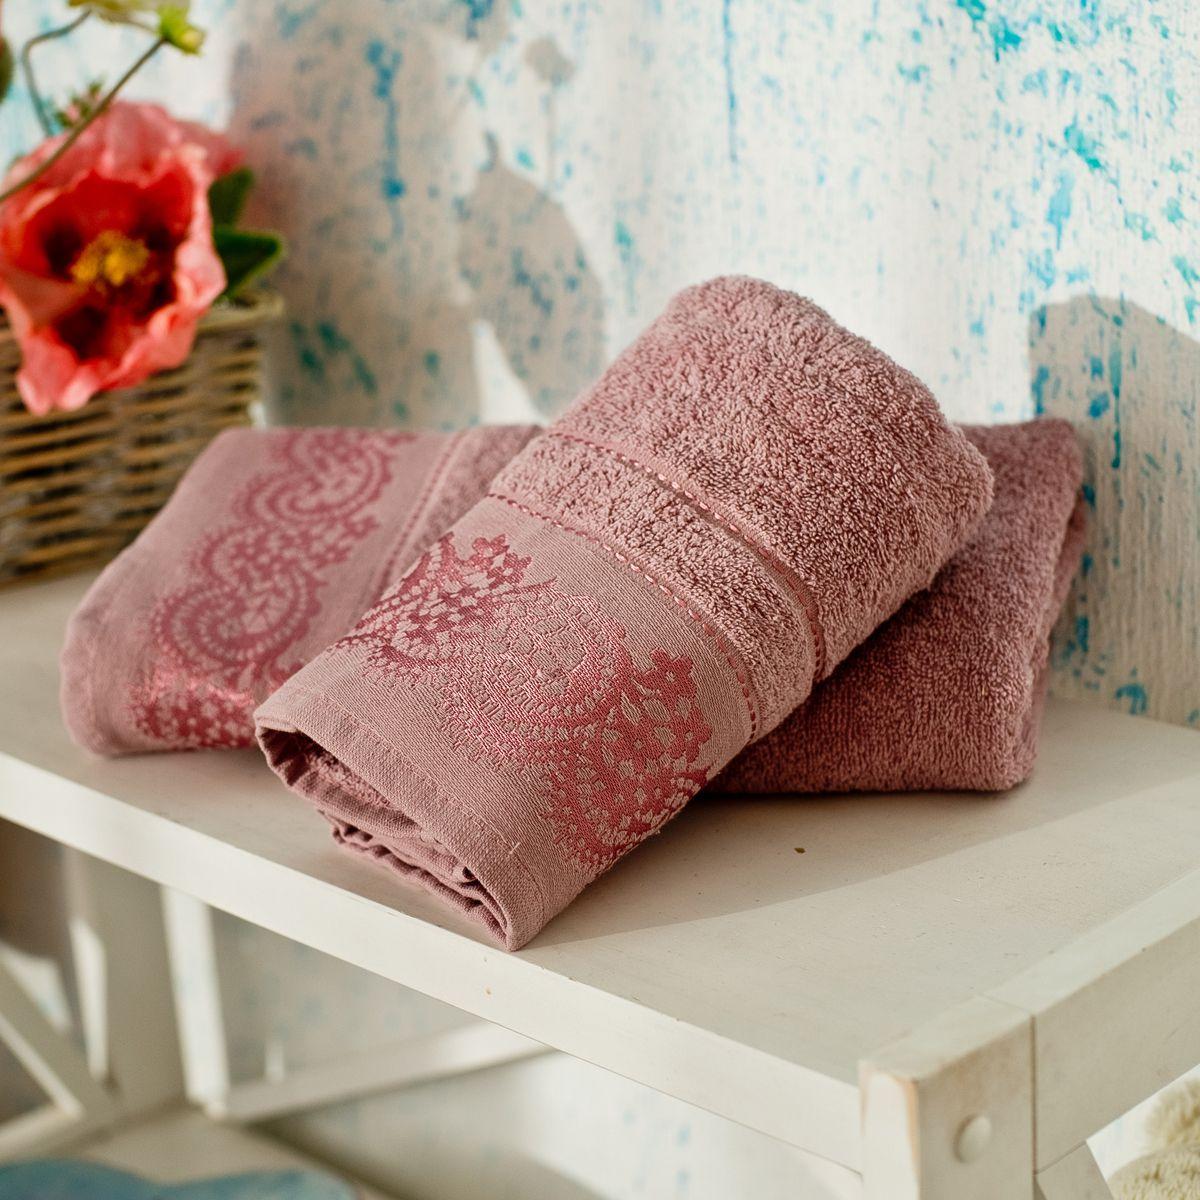 Полотенце махровое SoundSleep Odesse сухая роза 70х140(MG_91699166)Розовый